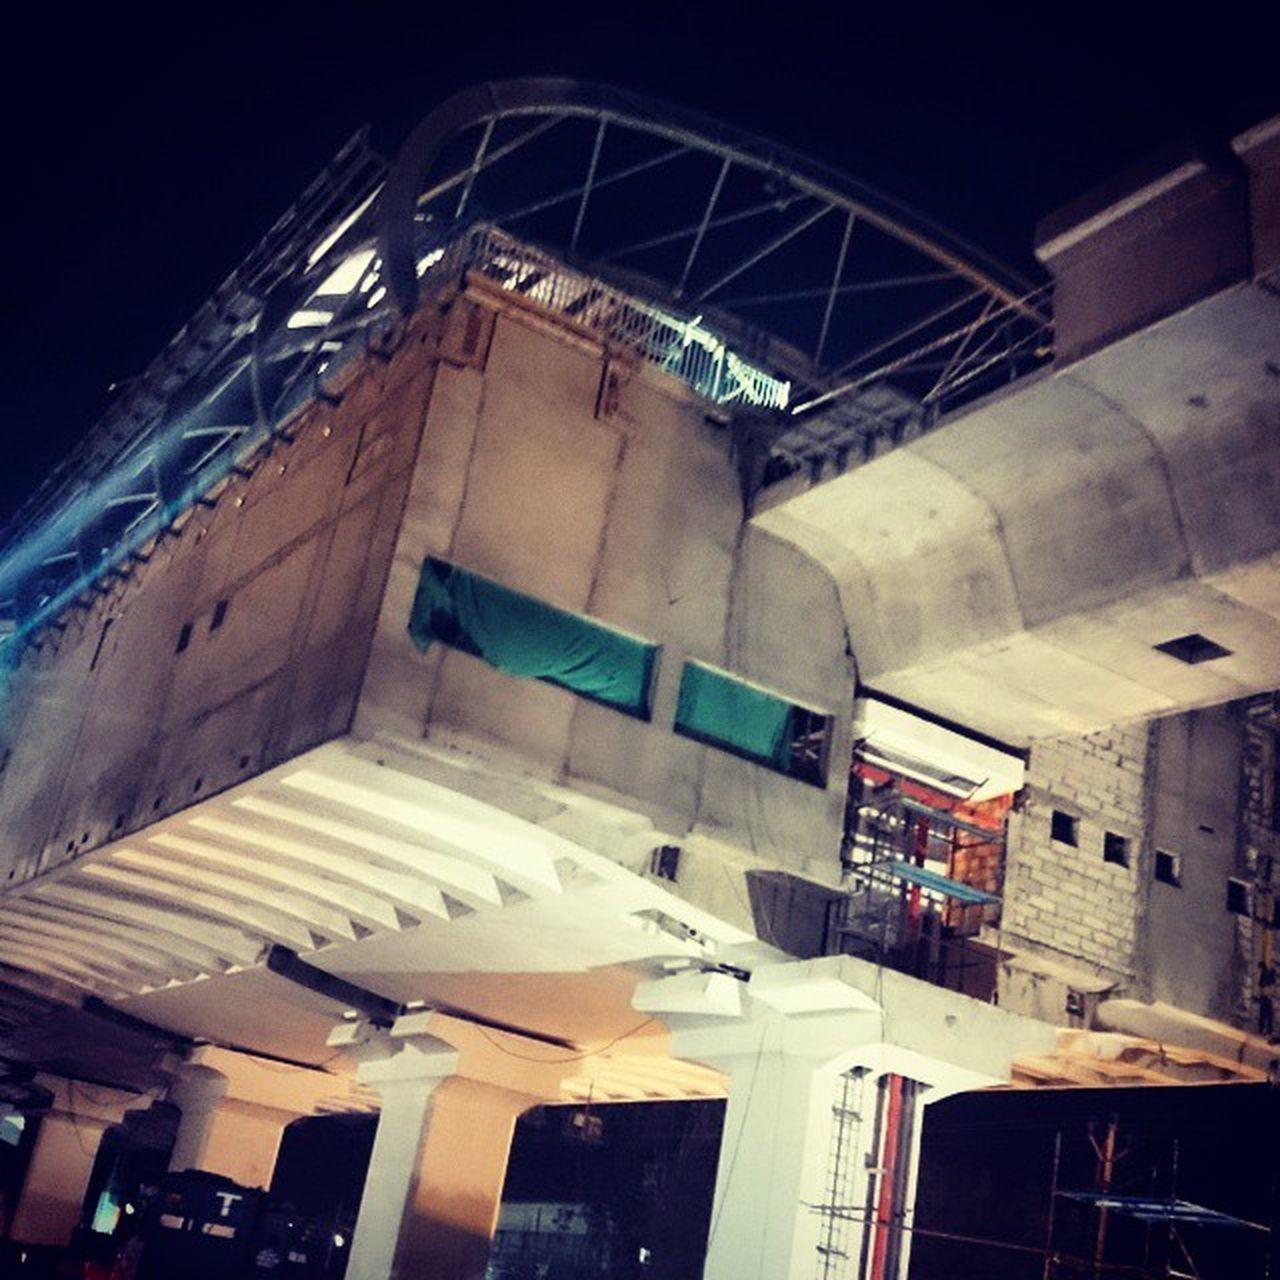 Buildingthemetro Nights  Workplaces Workinprogress